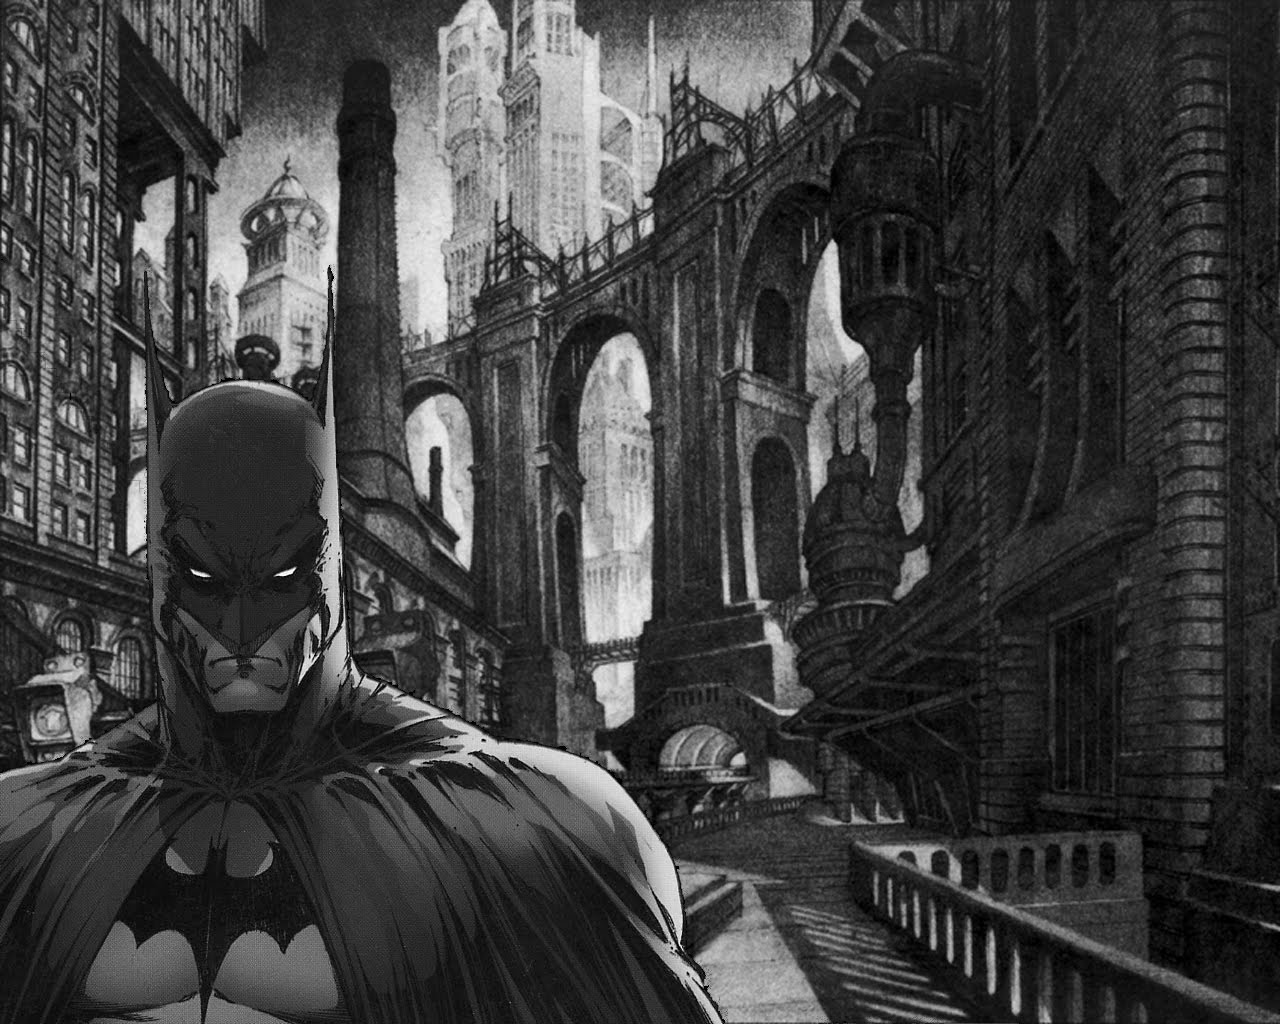 http://4.bp.blogspot.com/_CfryGPZRotM/TEQ7Gw06MjI/AAAAAAAABiQ/UHkcpoJNFMY/s1600/Batman%2525252520Wallpaper.jpg